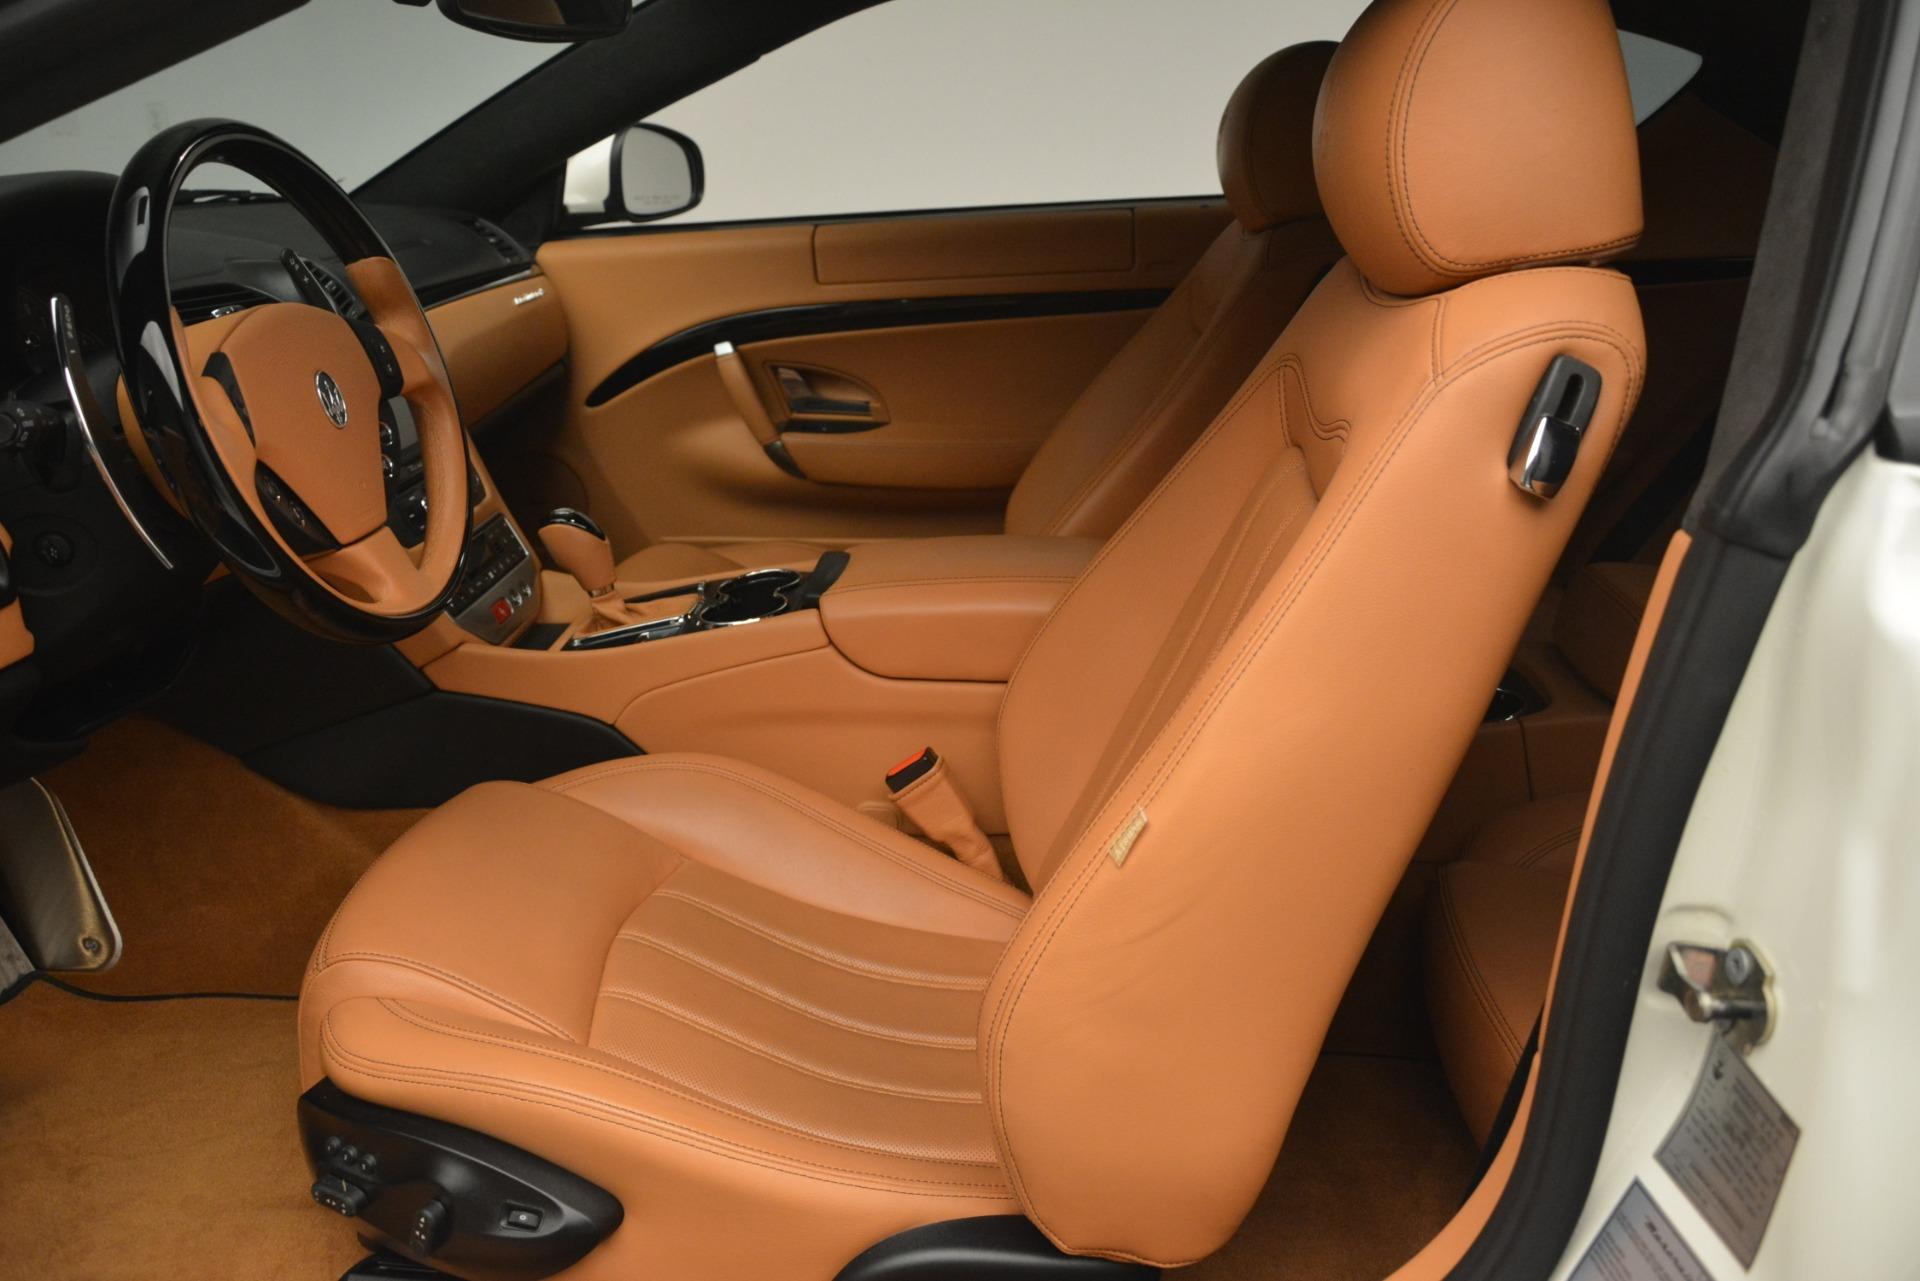 Used 2011 Maserati GranTurismo S Automatic For Sale In Westport, CT 3061_p14